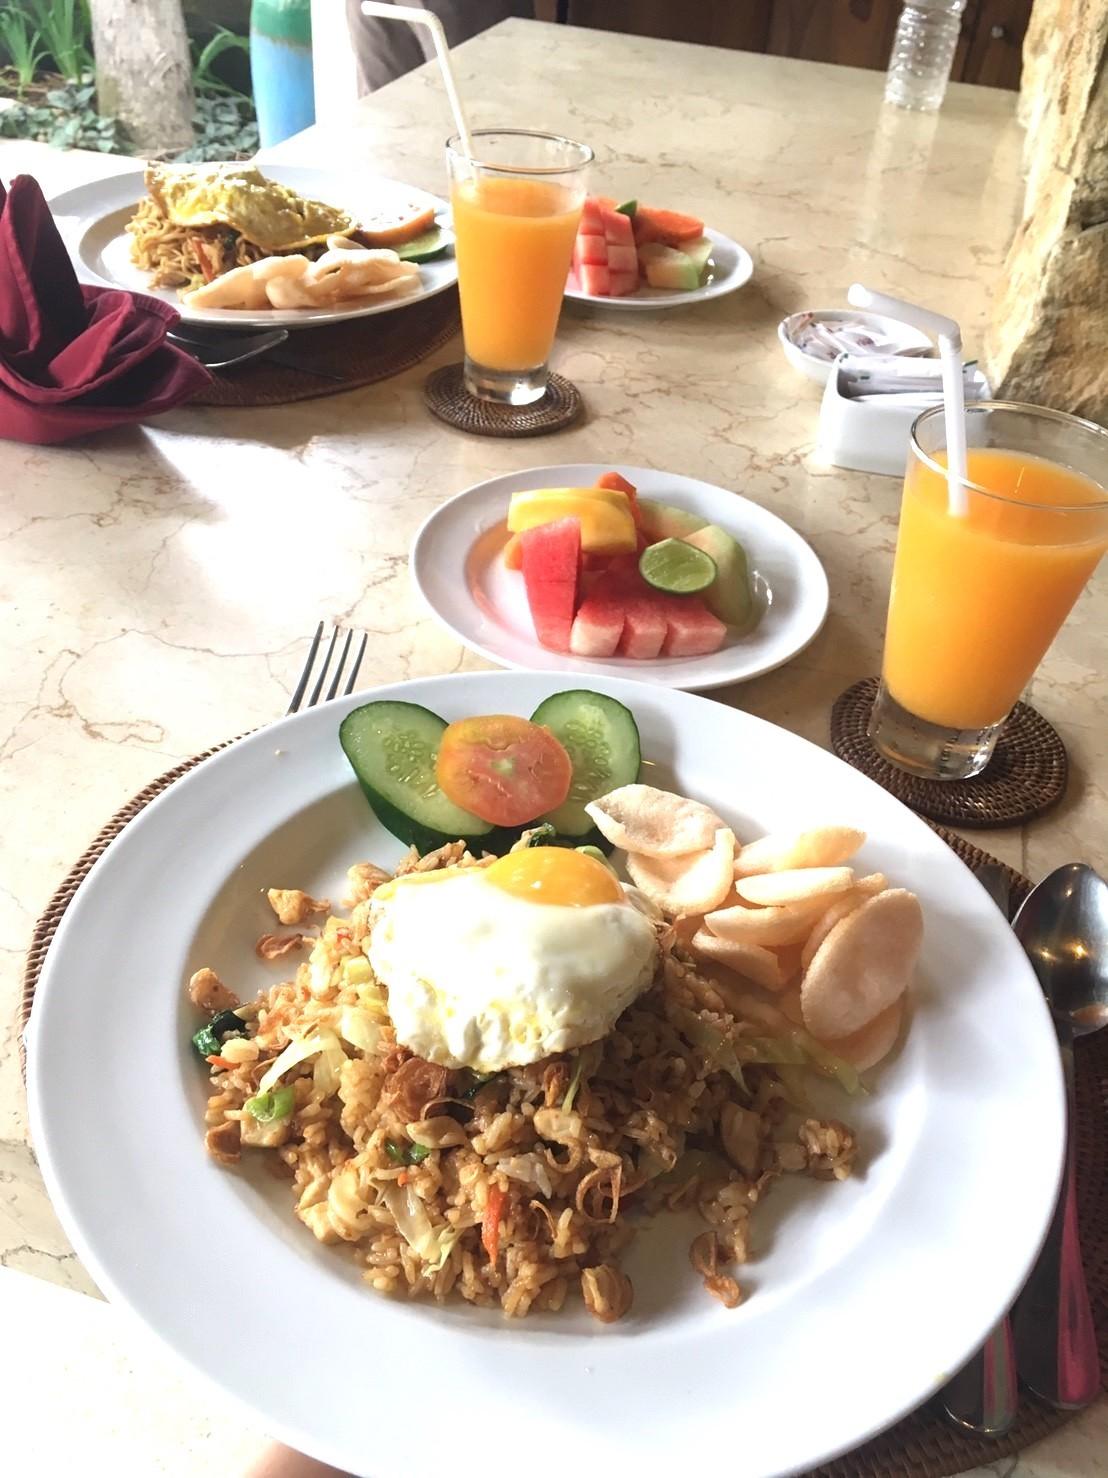 Bali Bali 1112-14_180817_0218